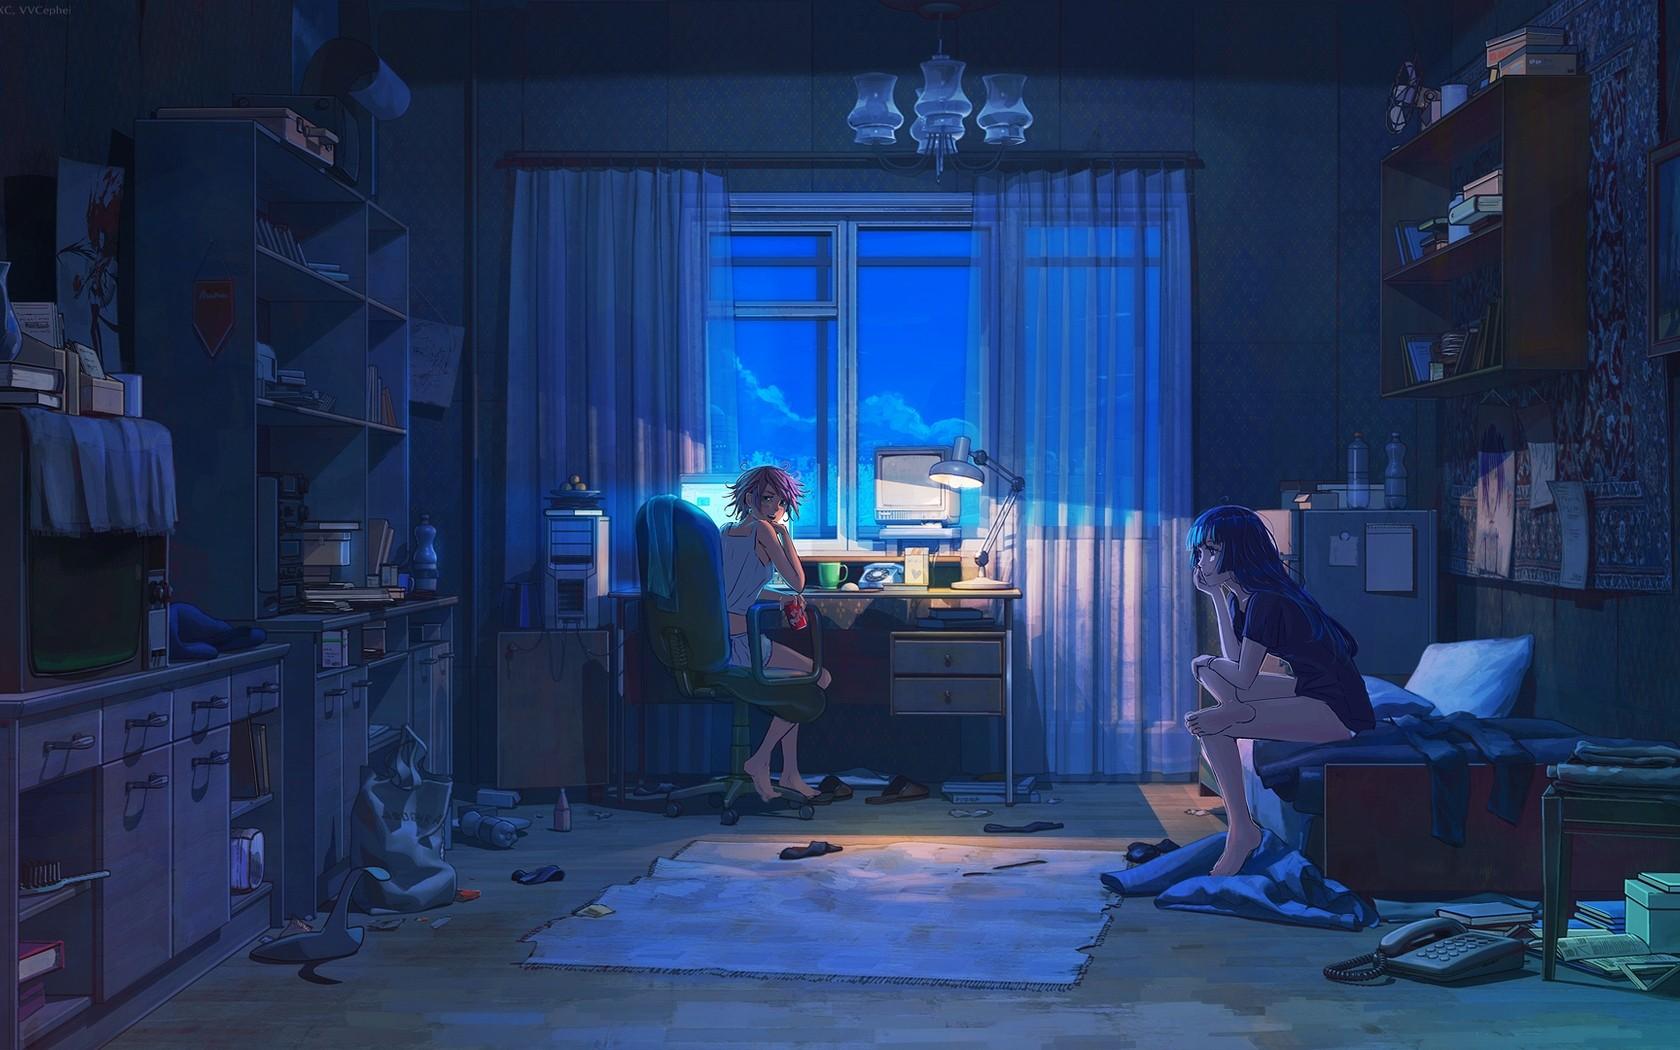 Anime Girls Room Wallpaper 1680x1050 ID49933 1680x1050